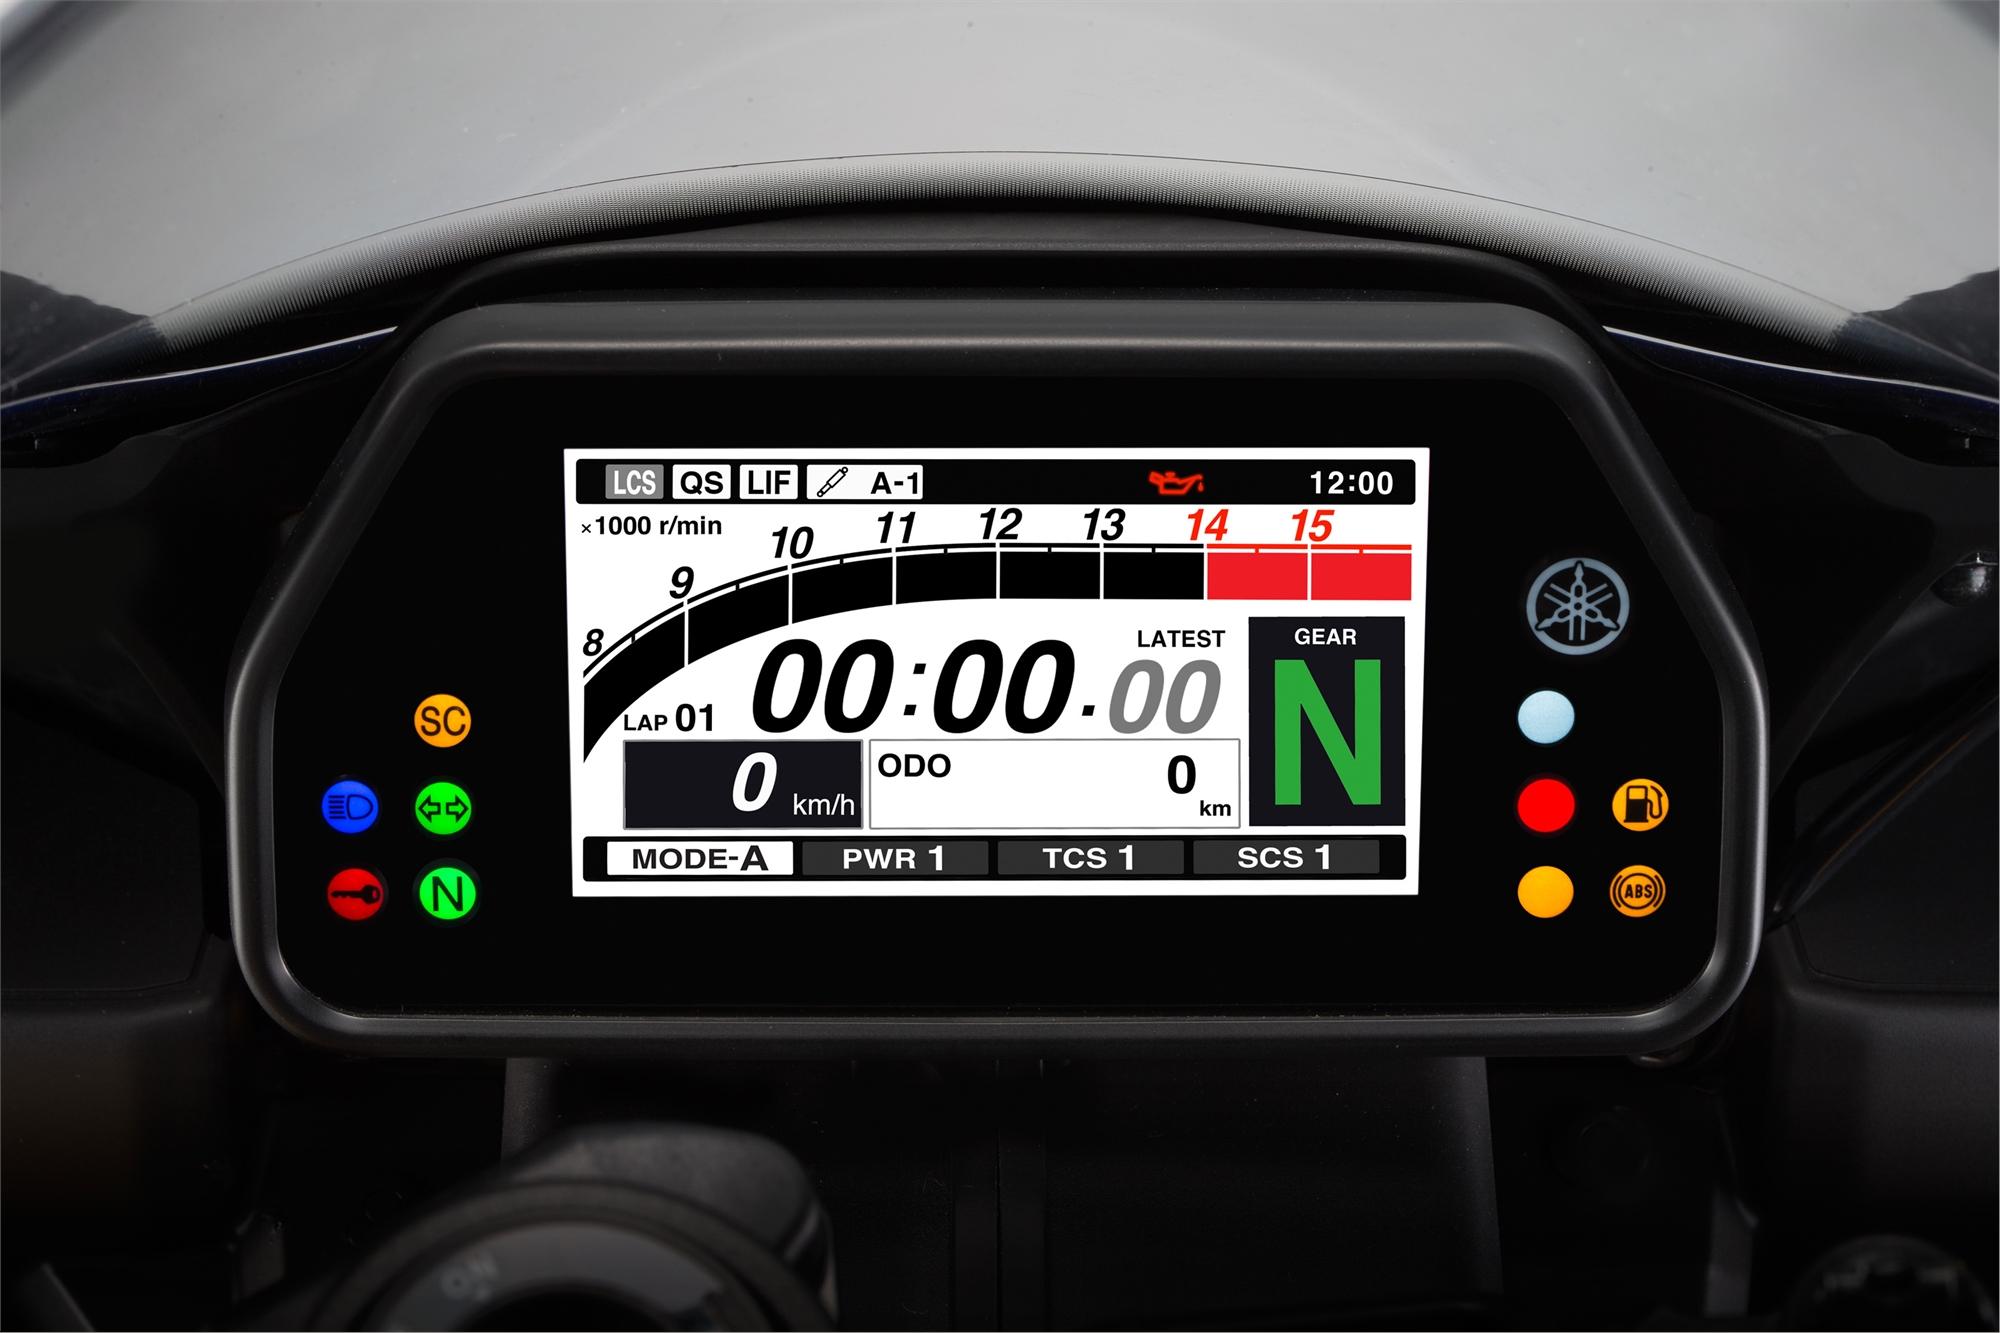 2015 Yamaha YZF-R1 Studio and Action Shots Show More ...